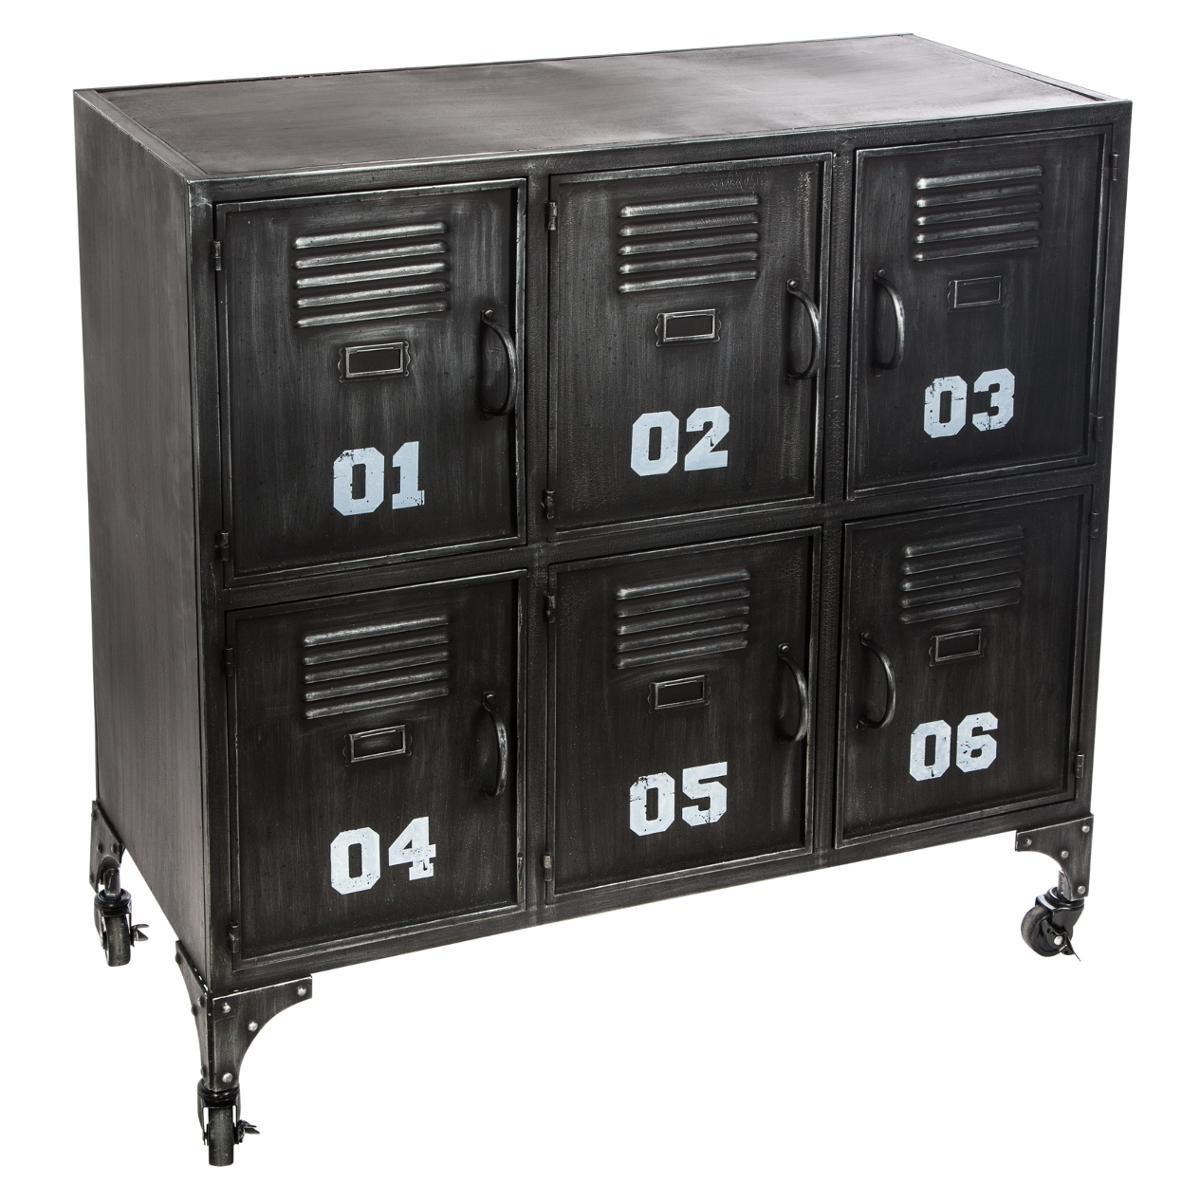 Meuble De Rangement Metal Noir.Meuble Rangement Metal Noir 6 Portes Ref 3002207